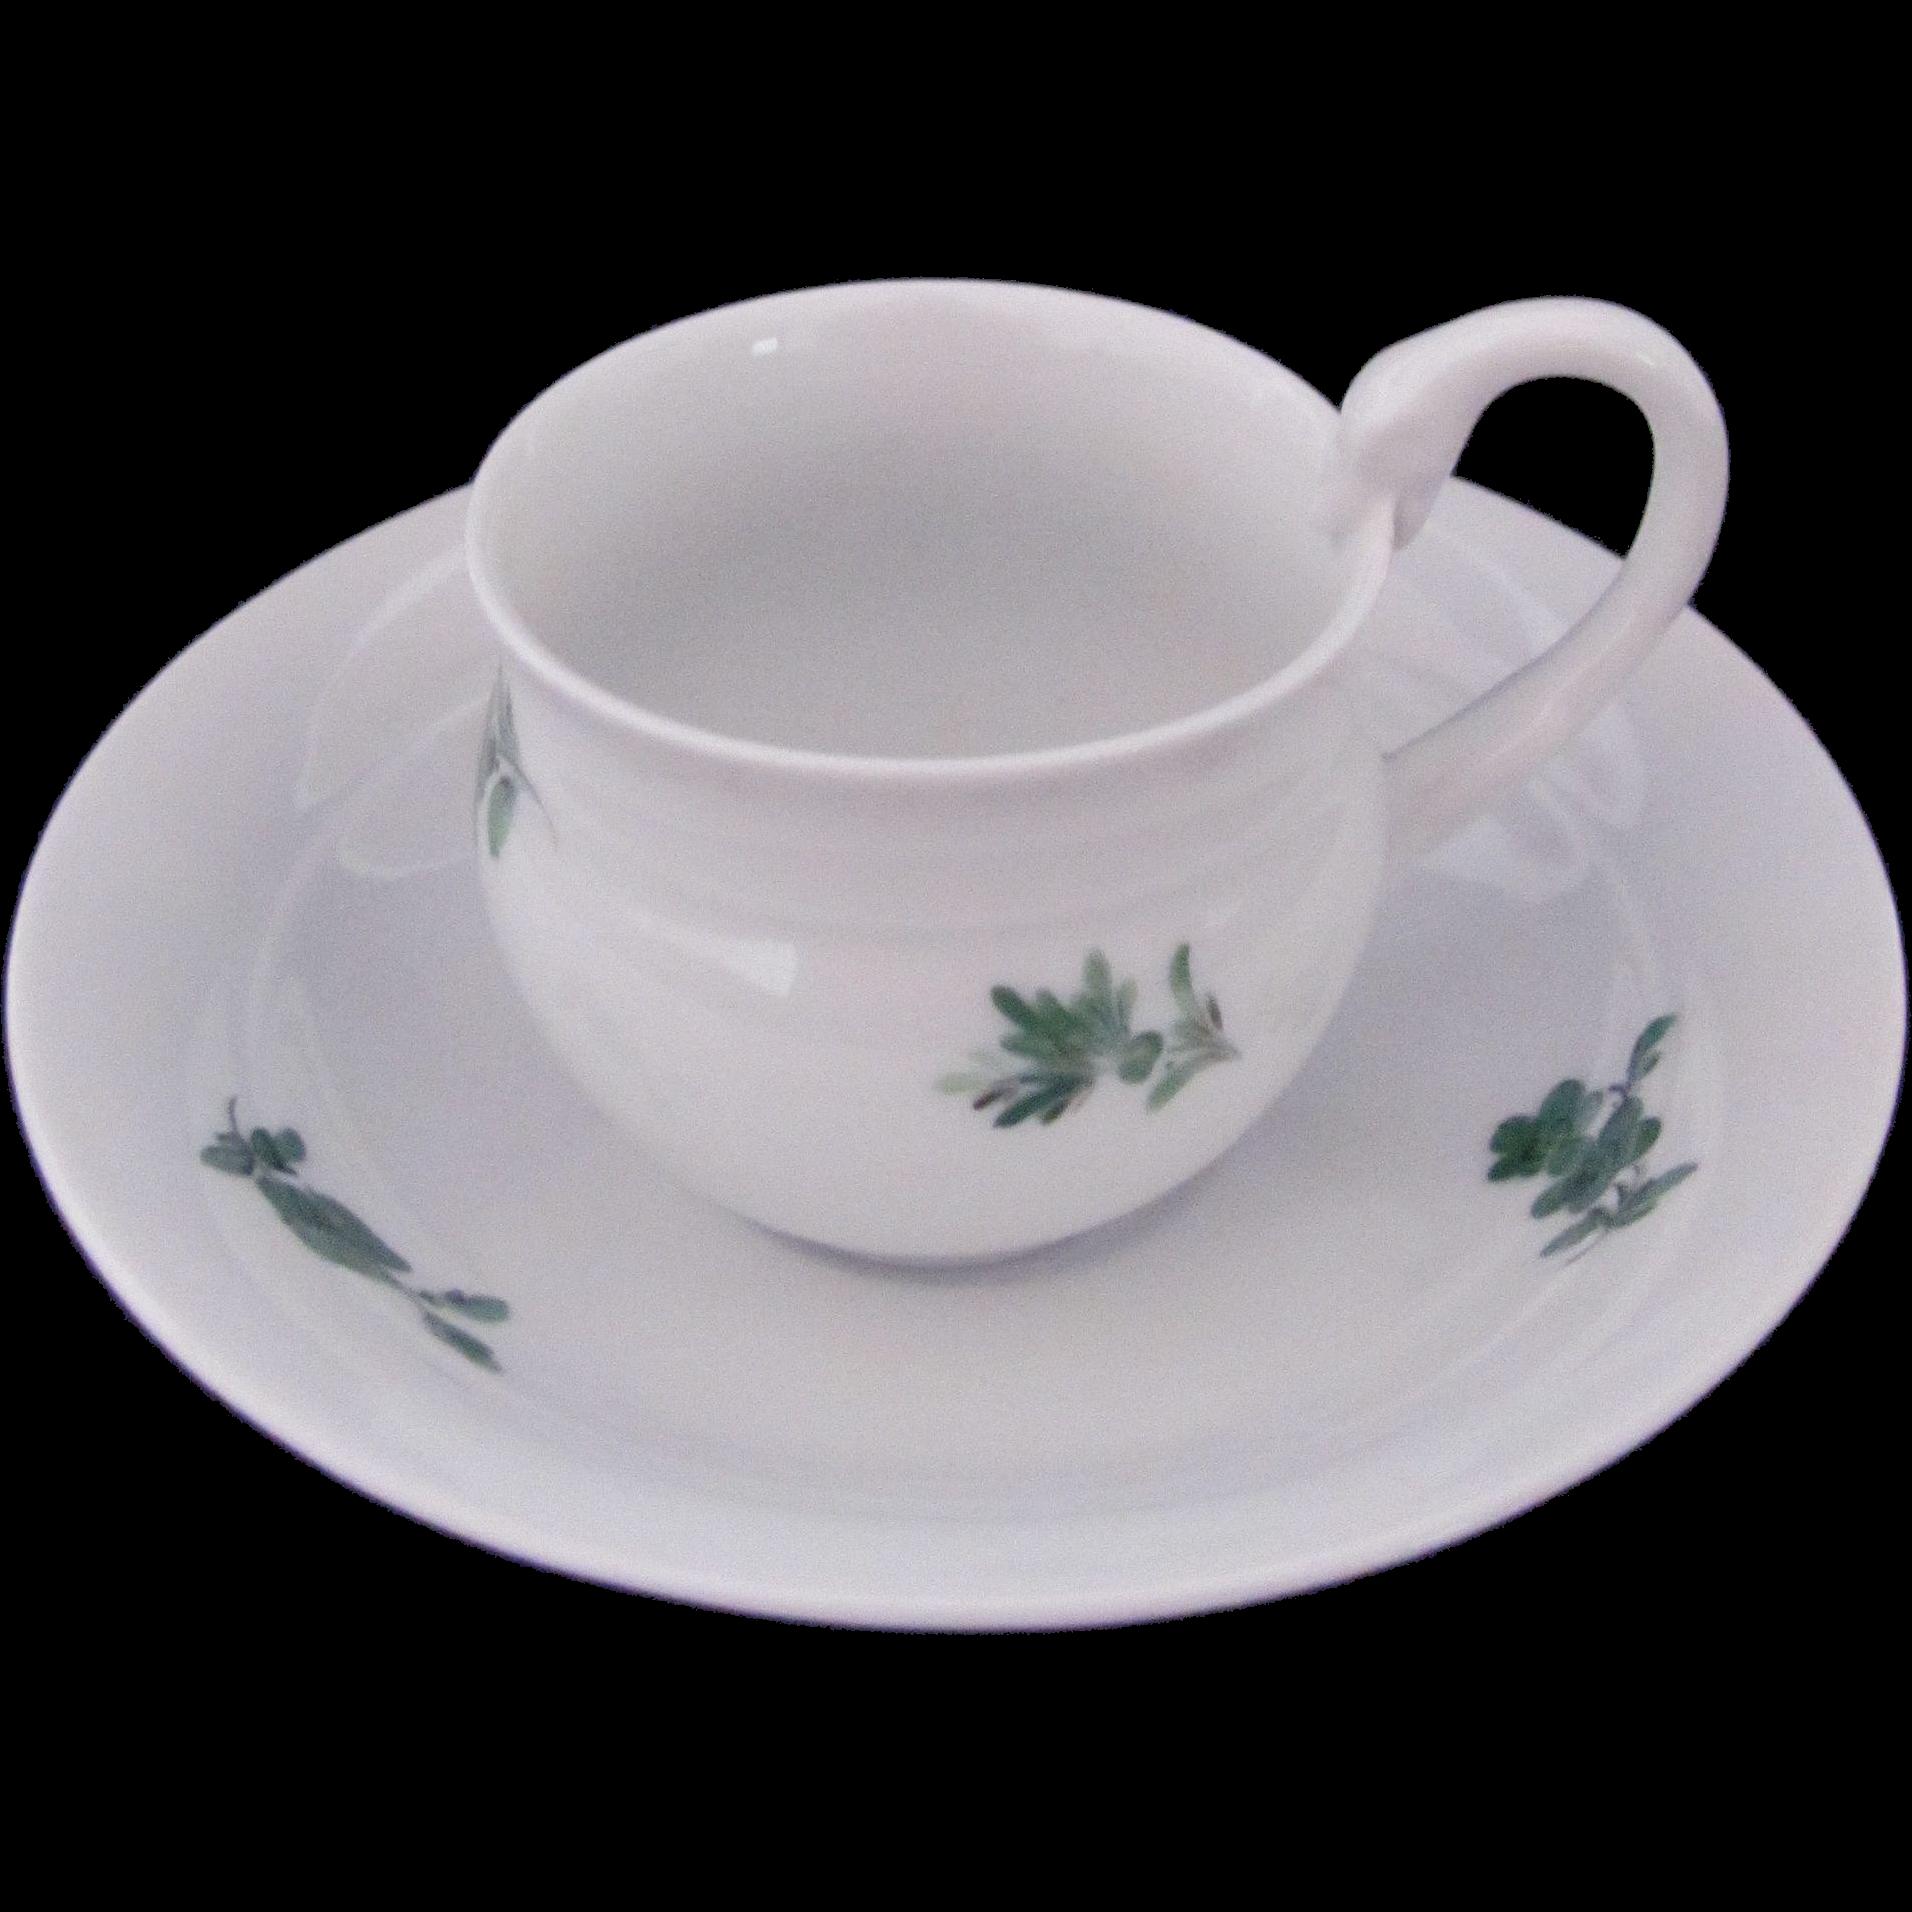 MEISSEN Demitasse Cup Saucer White Green Flowers Swan First Quality